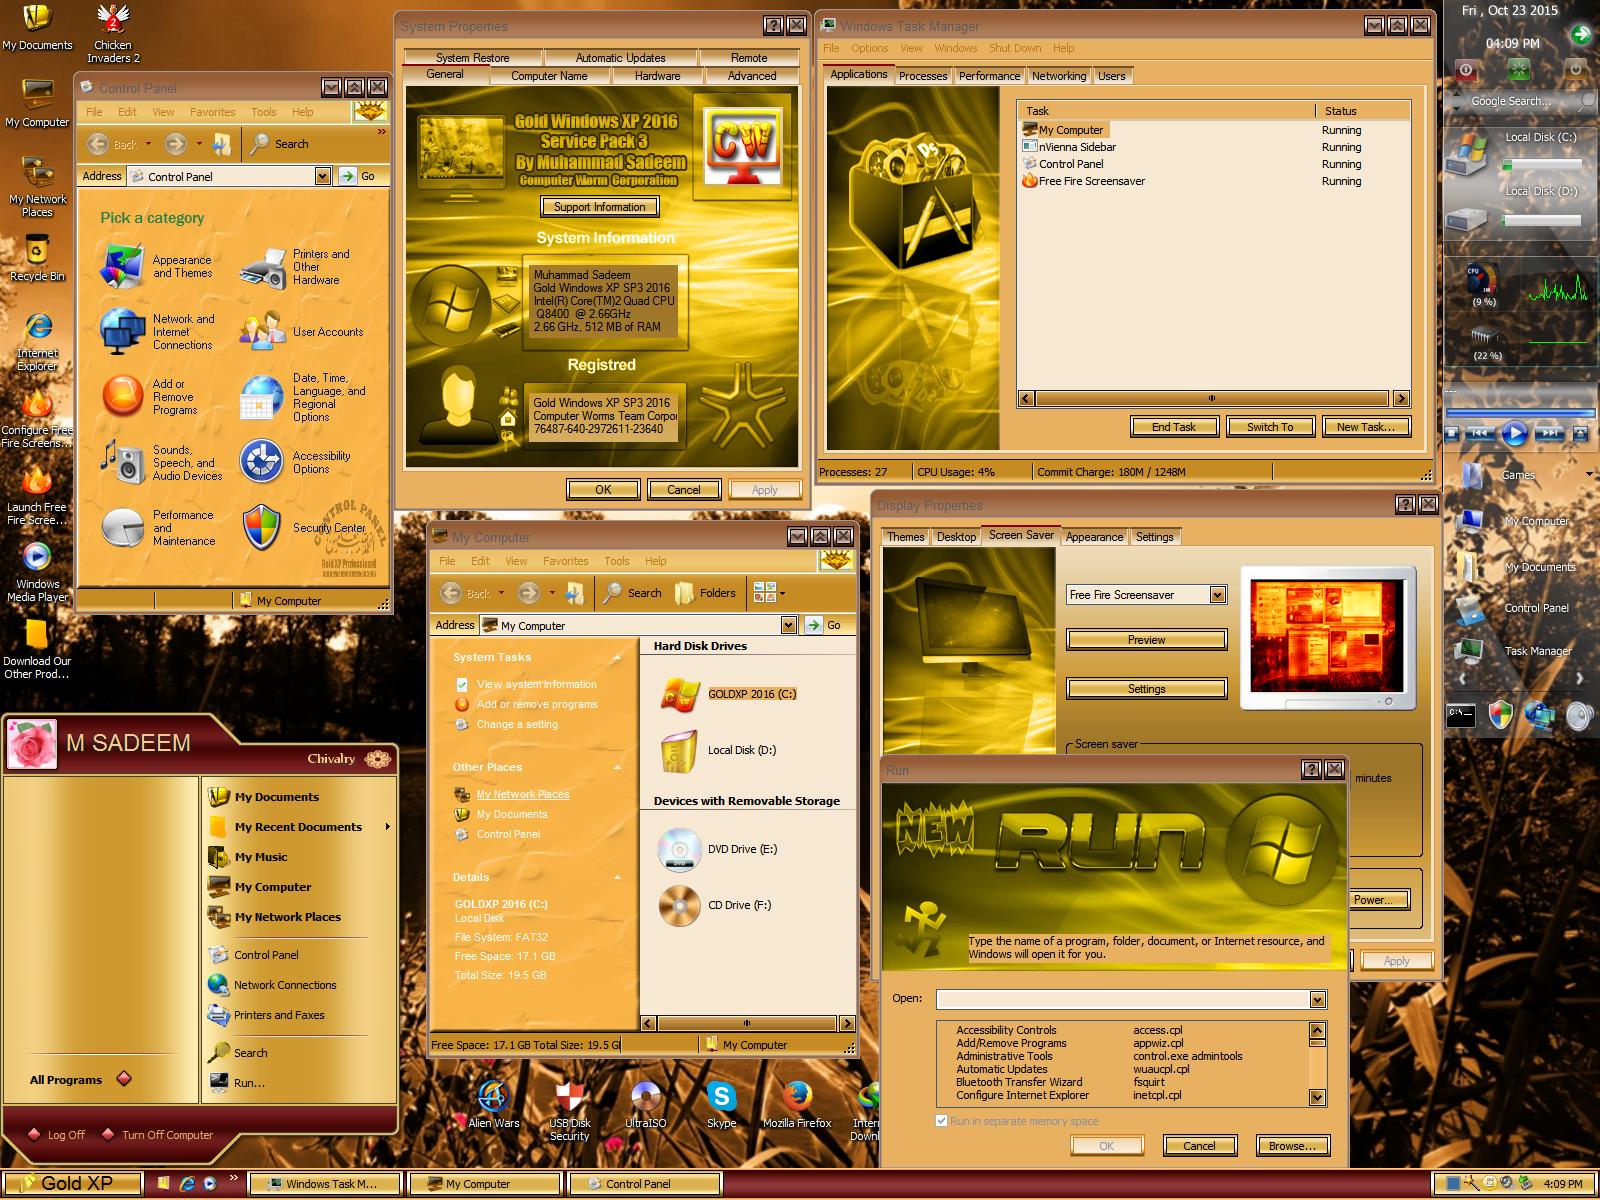 windows xp full download iso